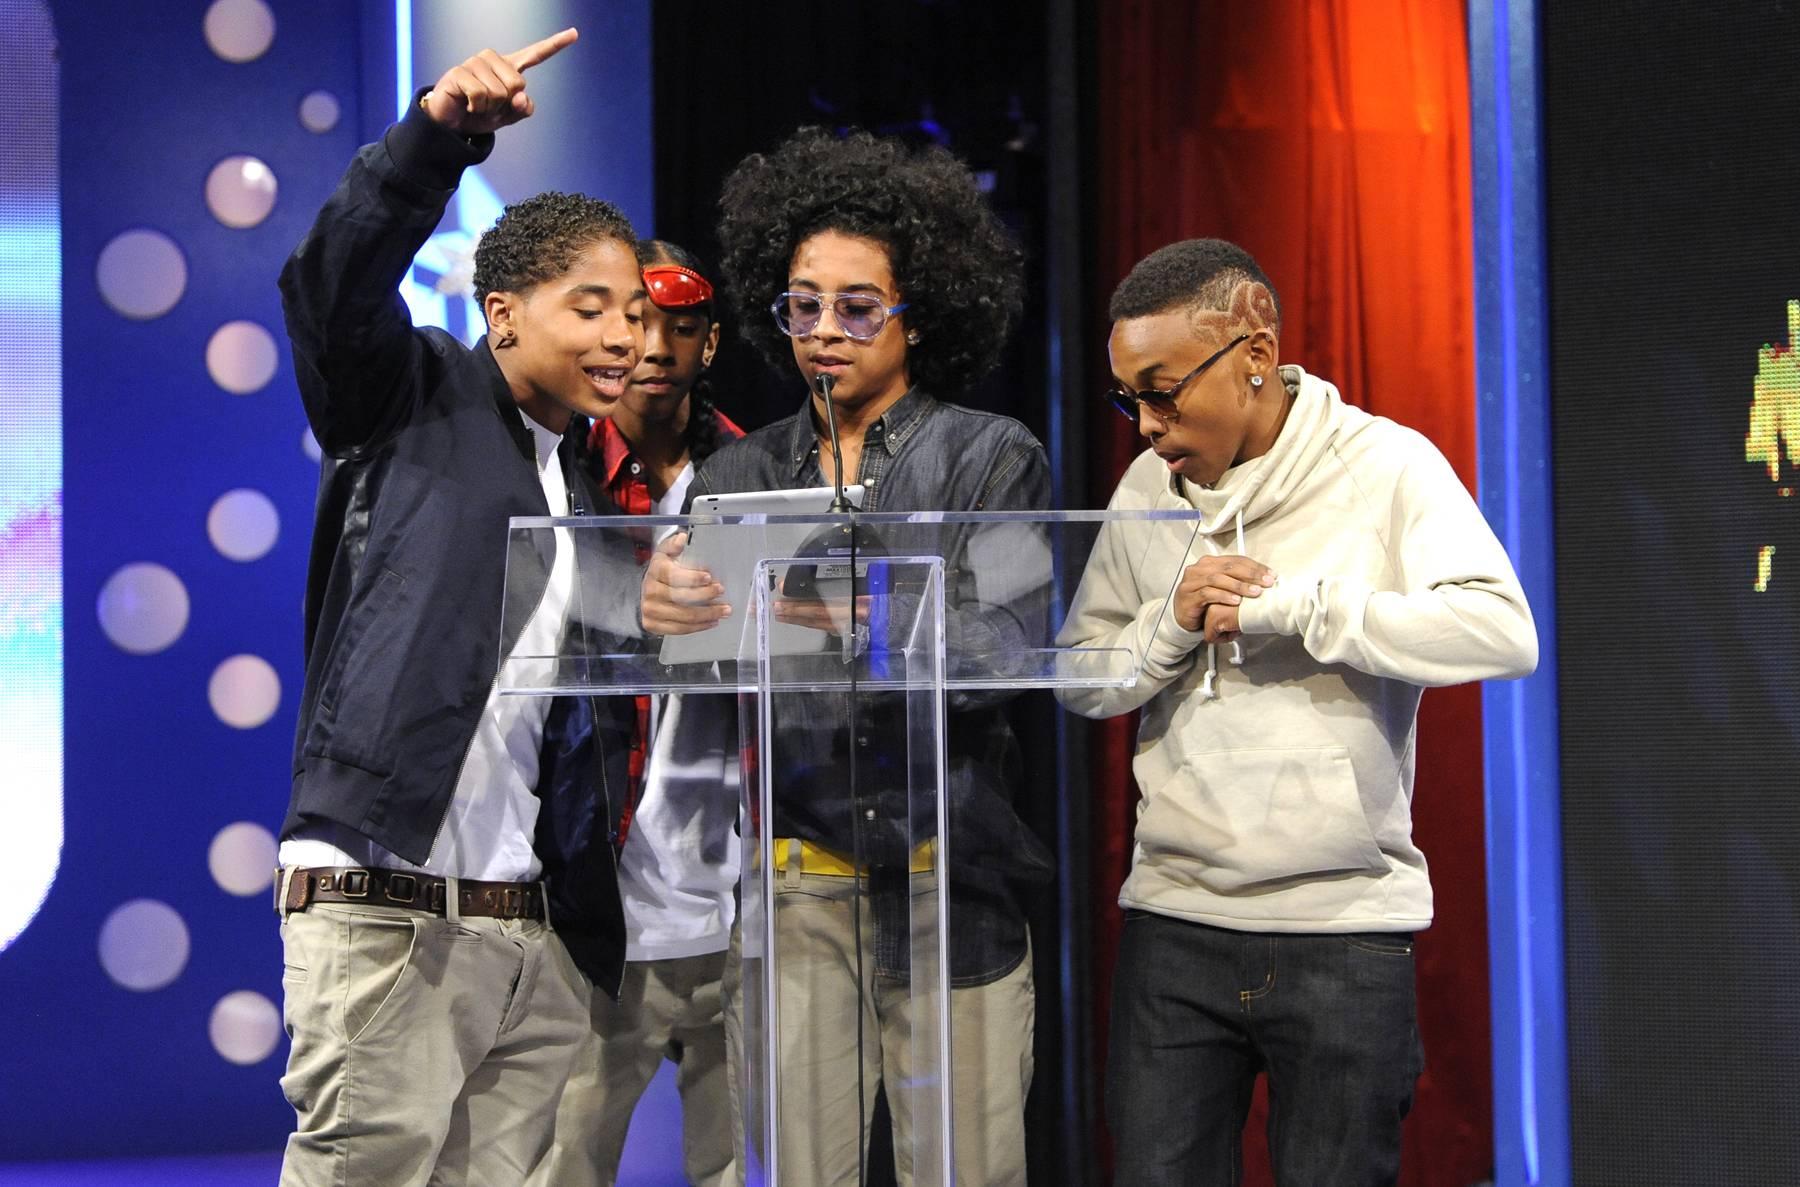 Teamwork Makes the Dream Work - Mindless Behavior at 106 & Park, May 22, 2012. (Photo: John Ricard / BET)